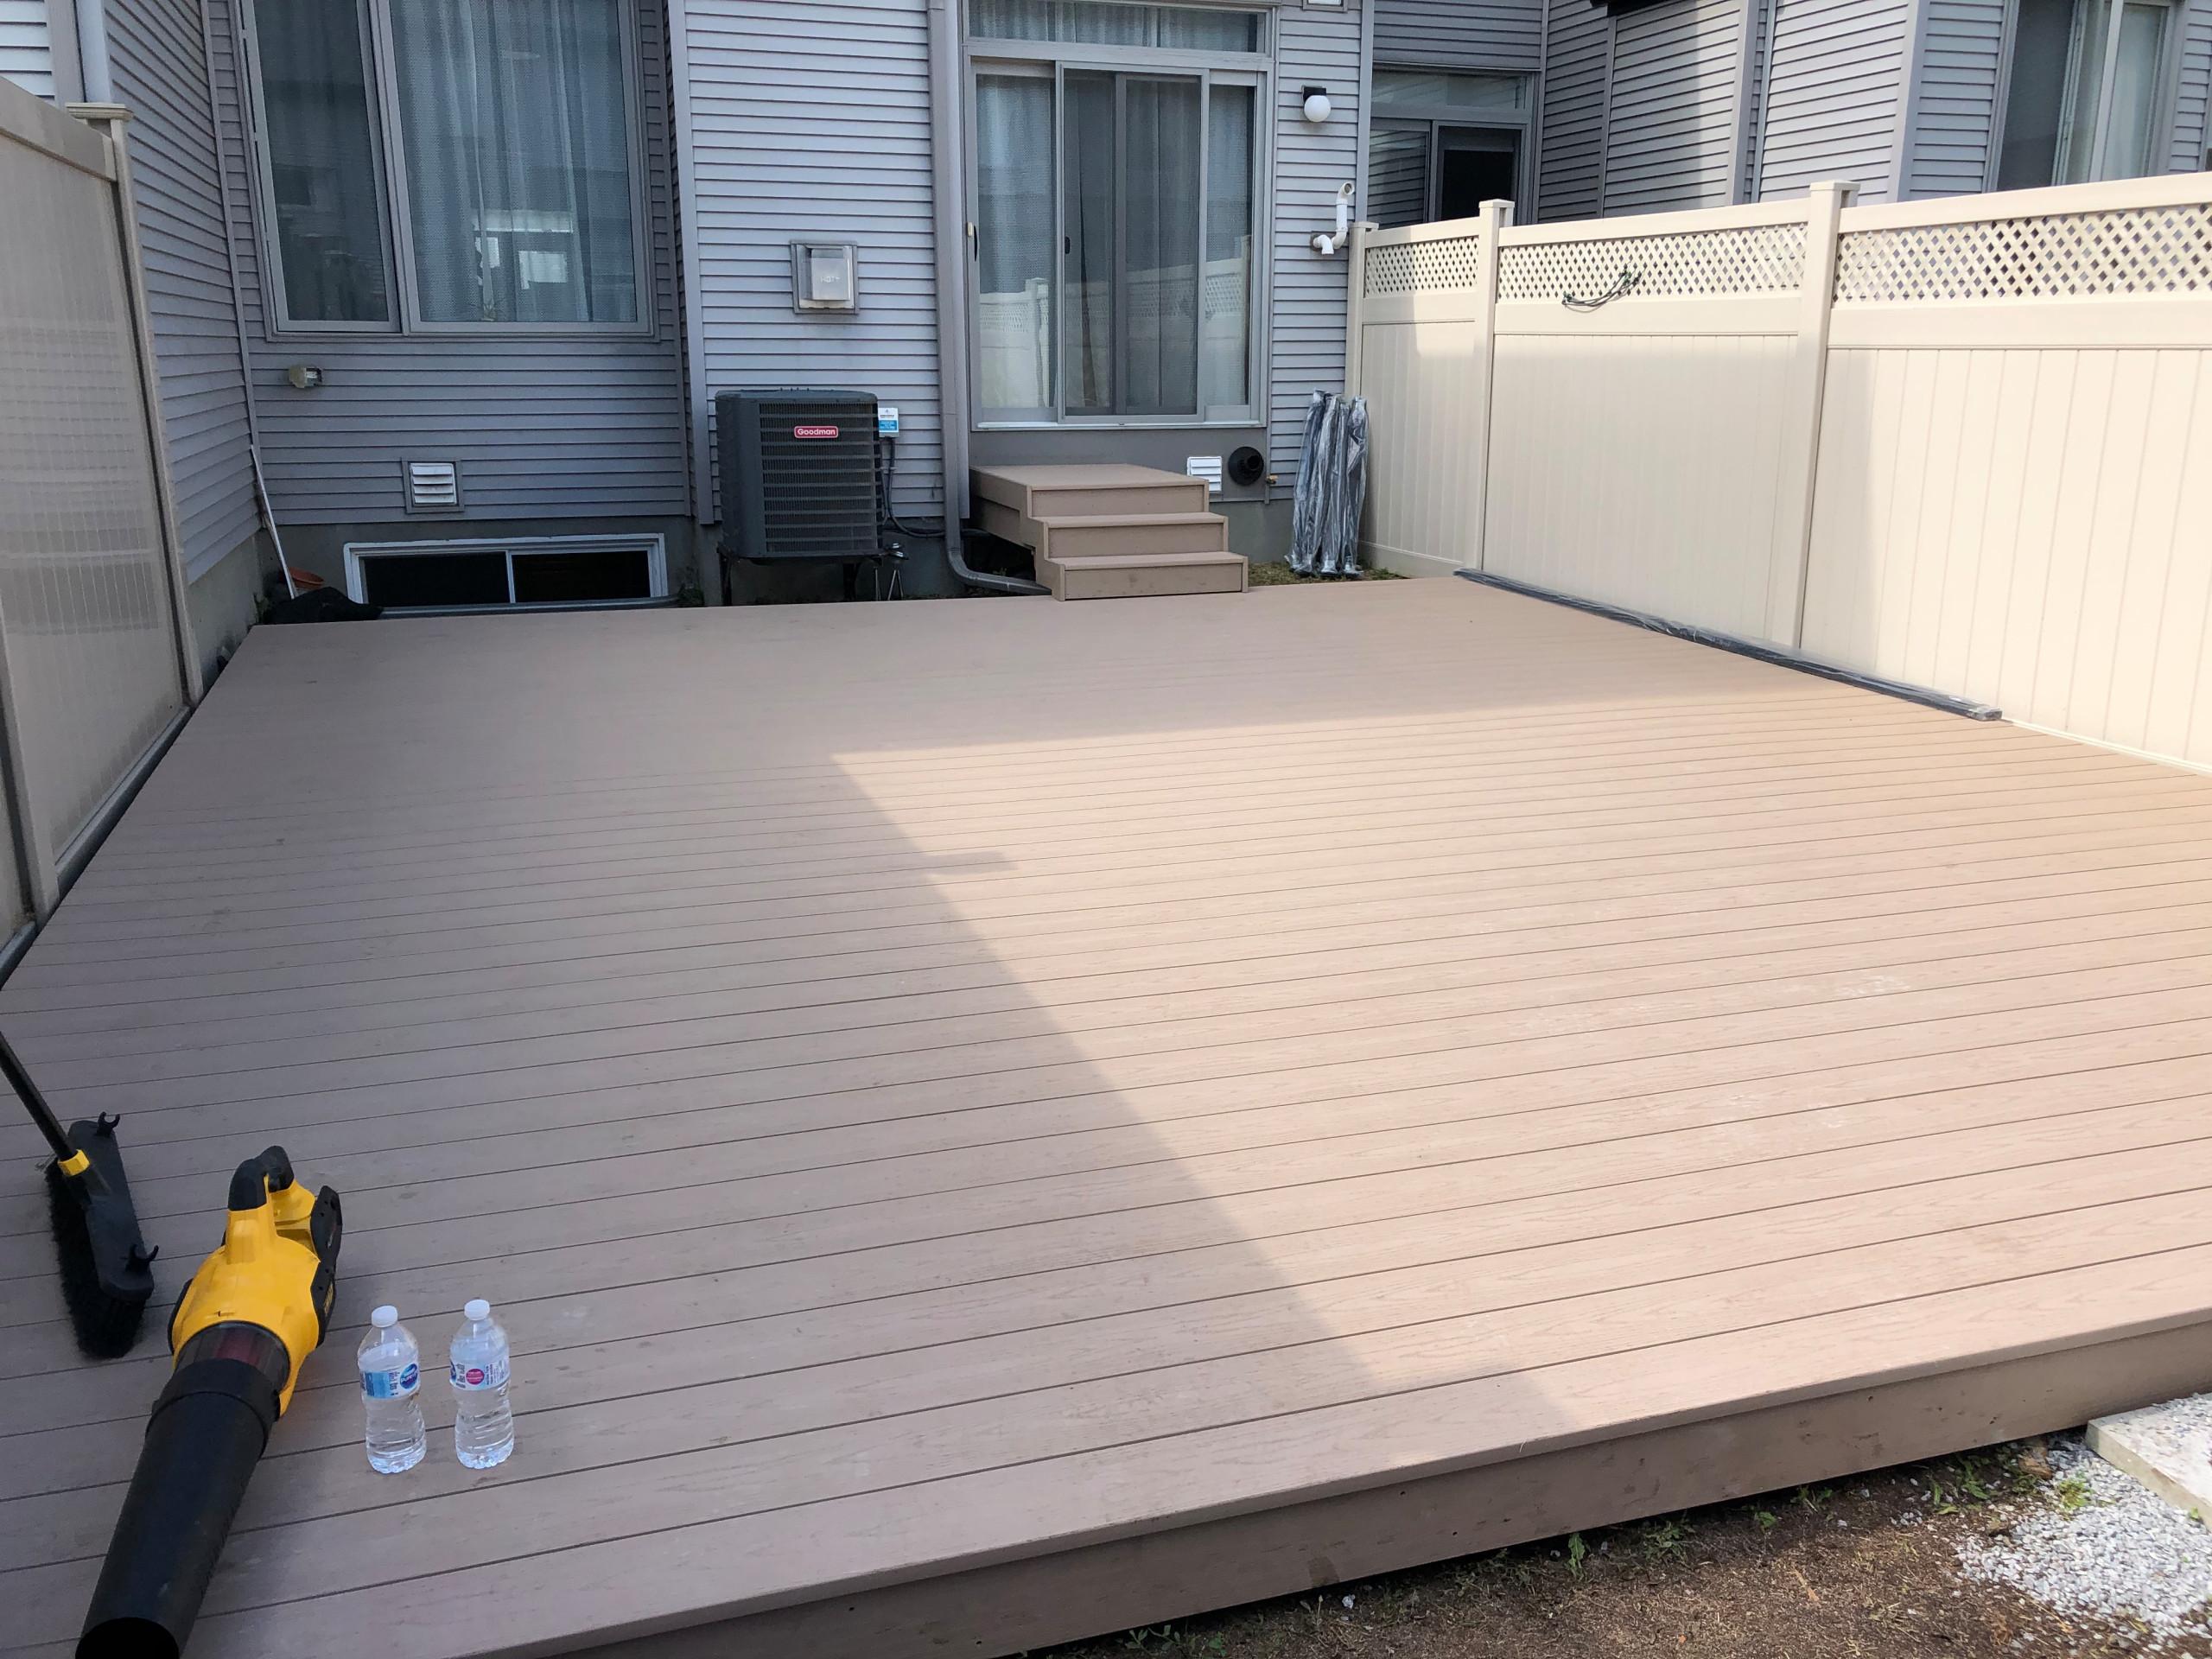 450 sq ft Brownstone